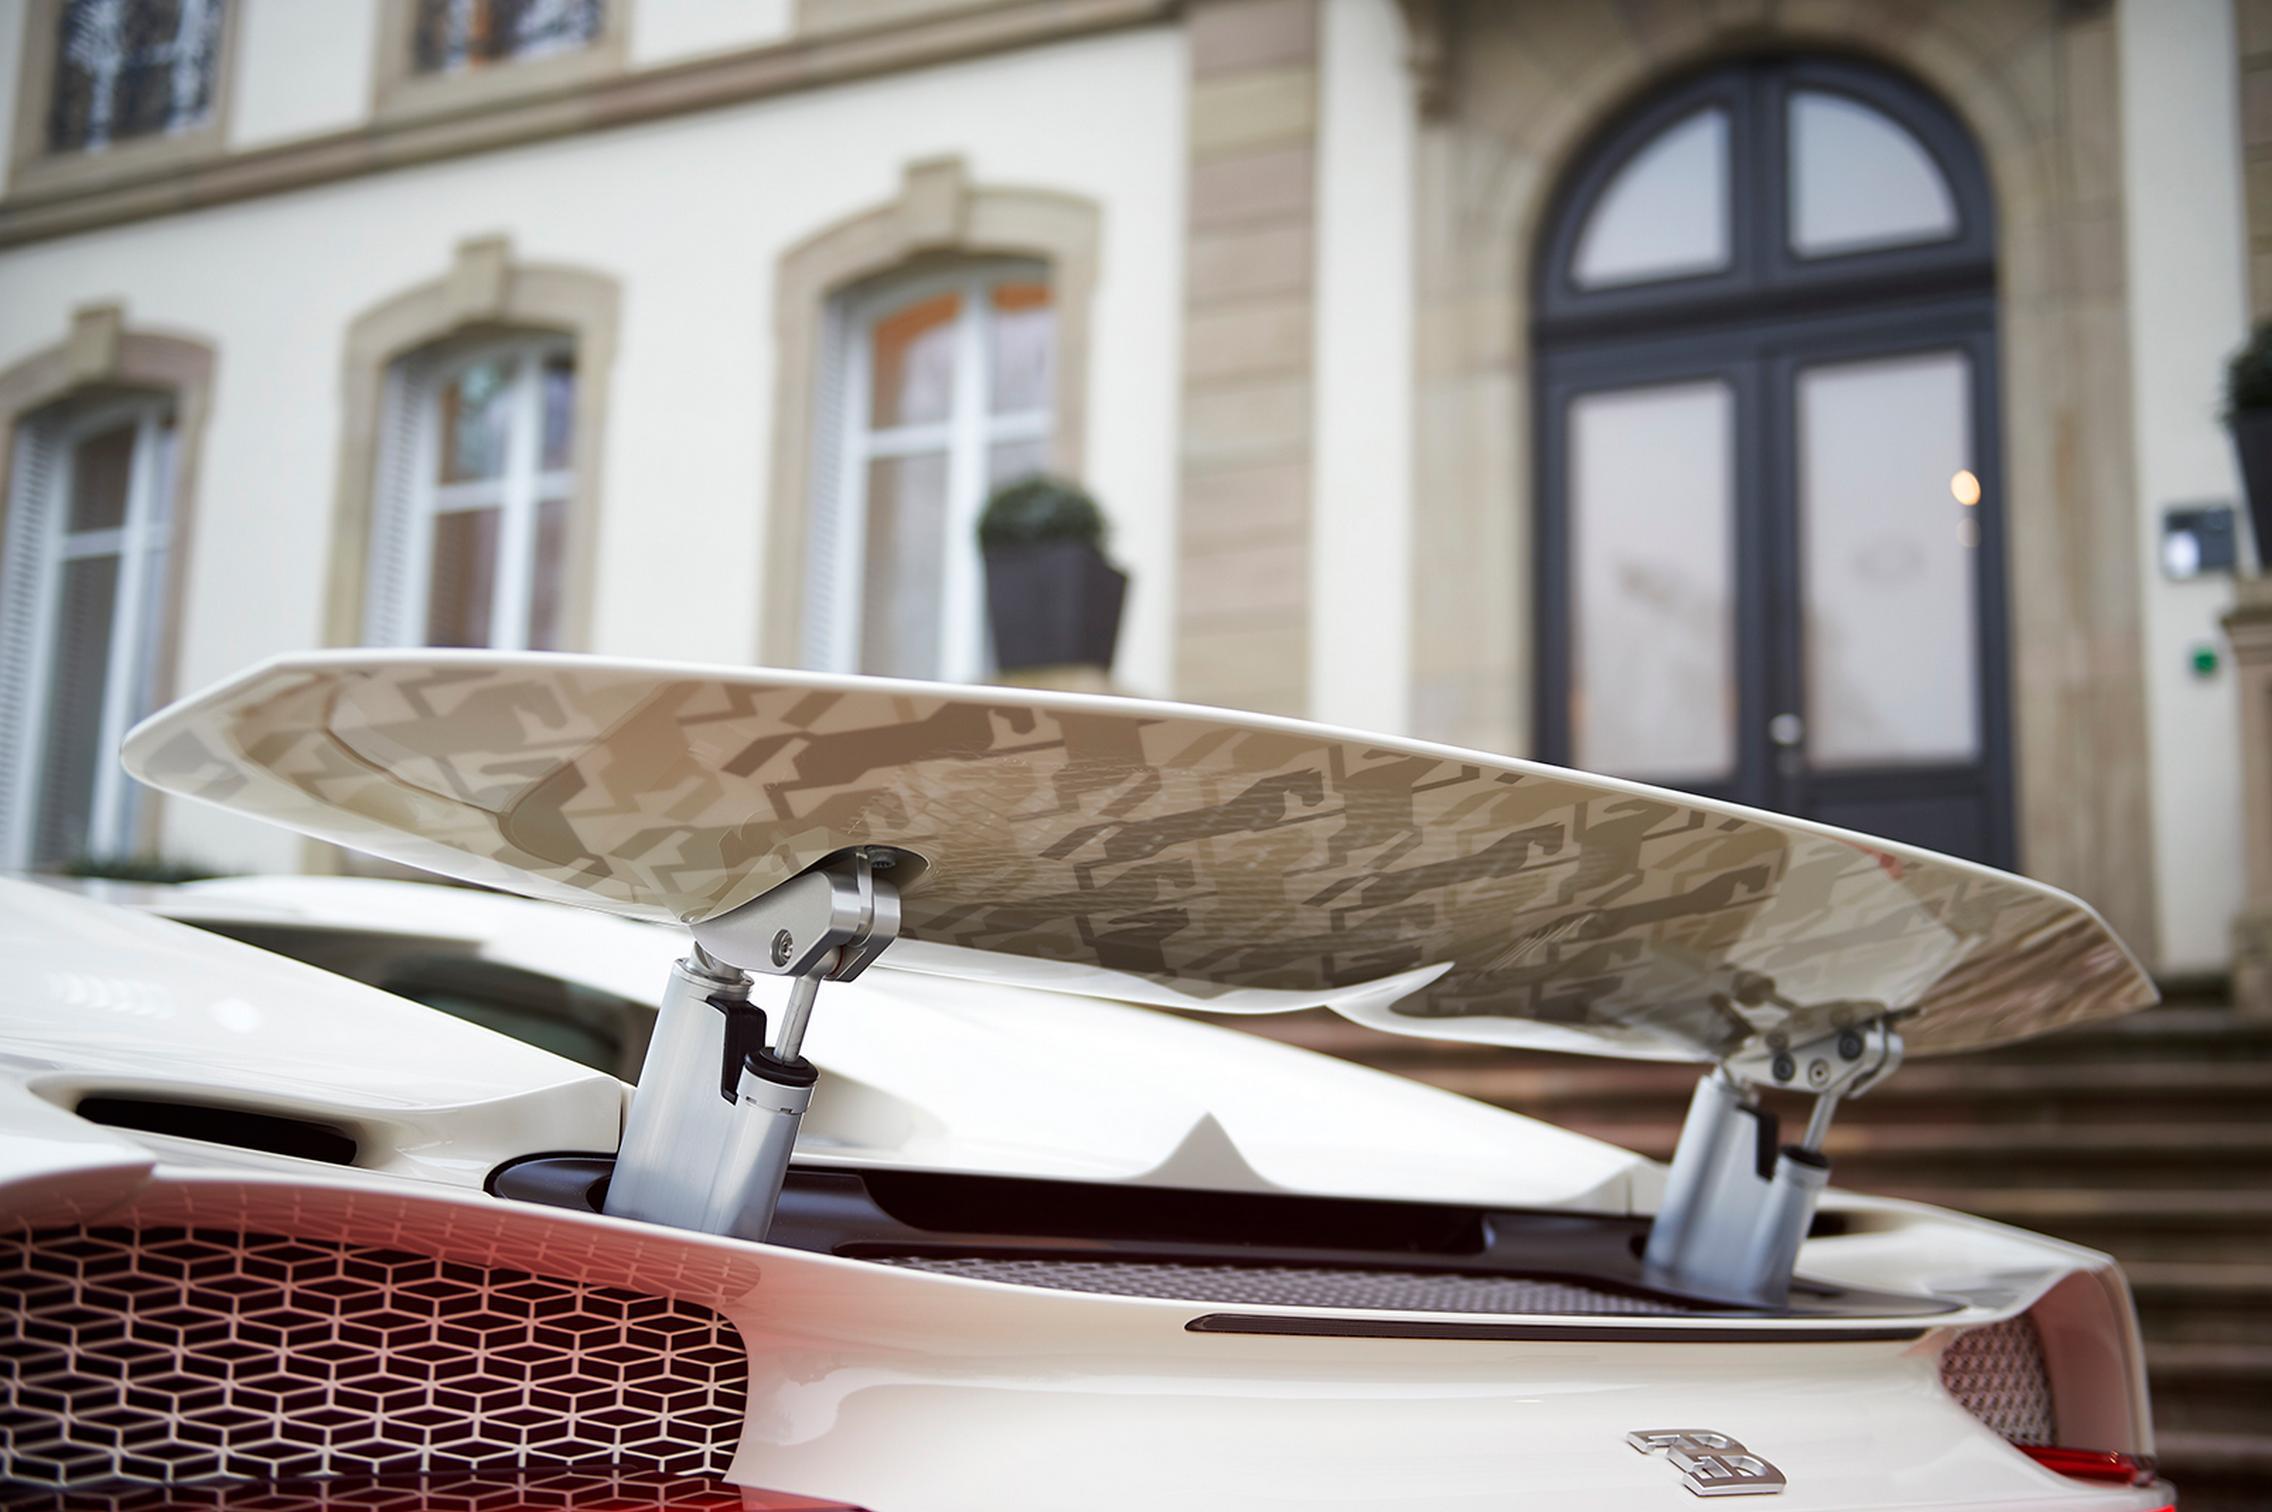 Hermes Bugatti Chiron rear wing